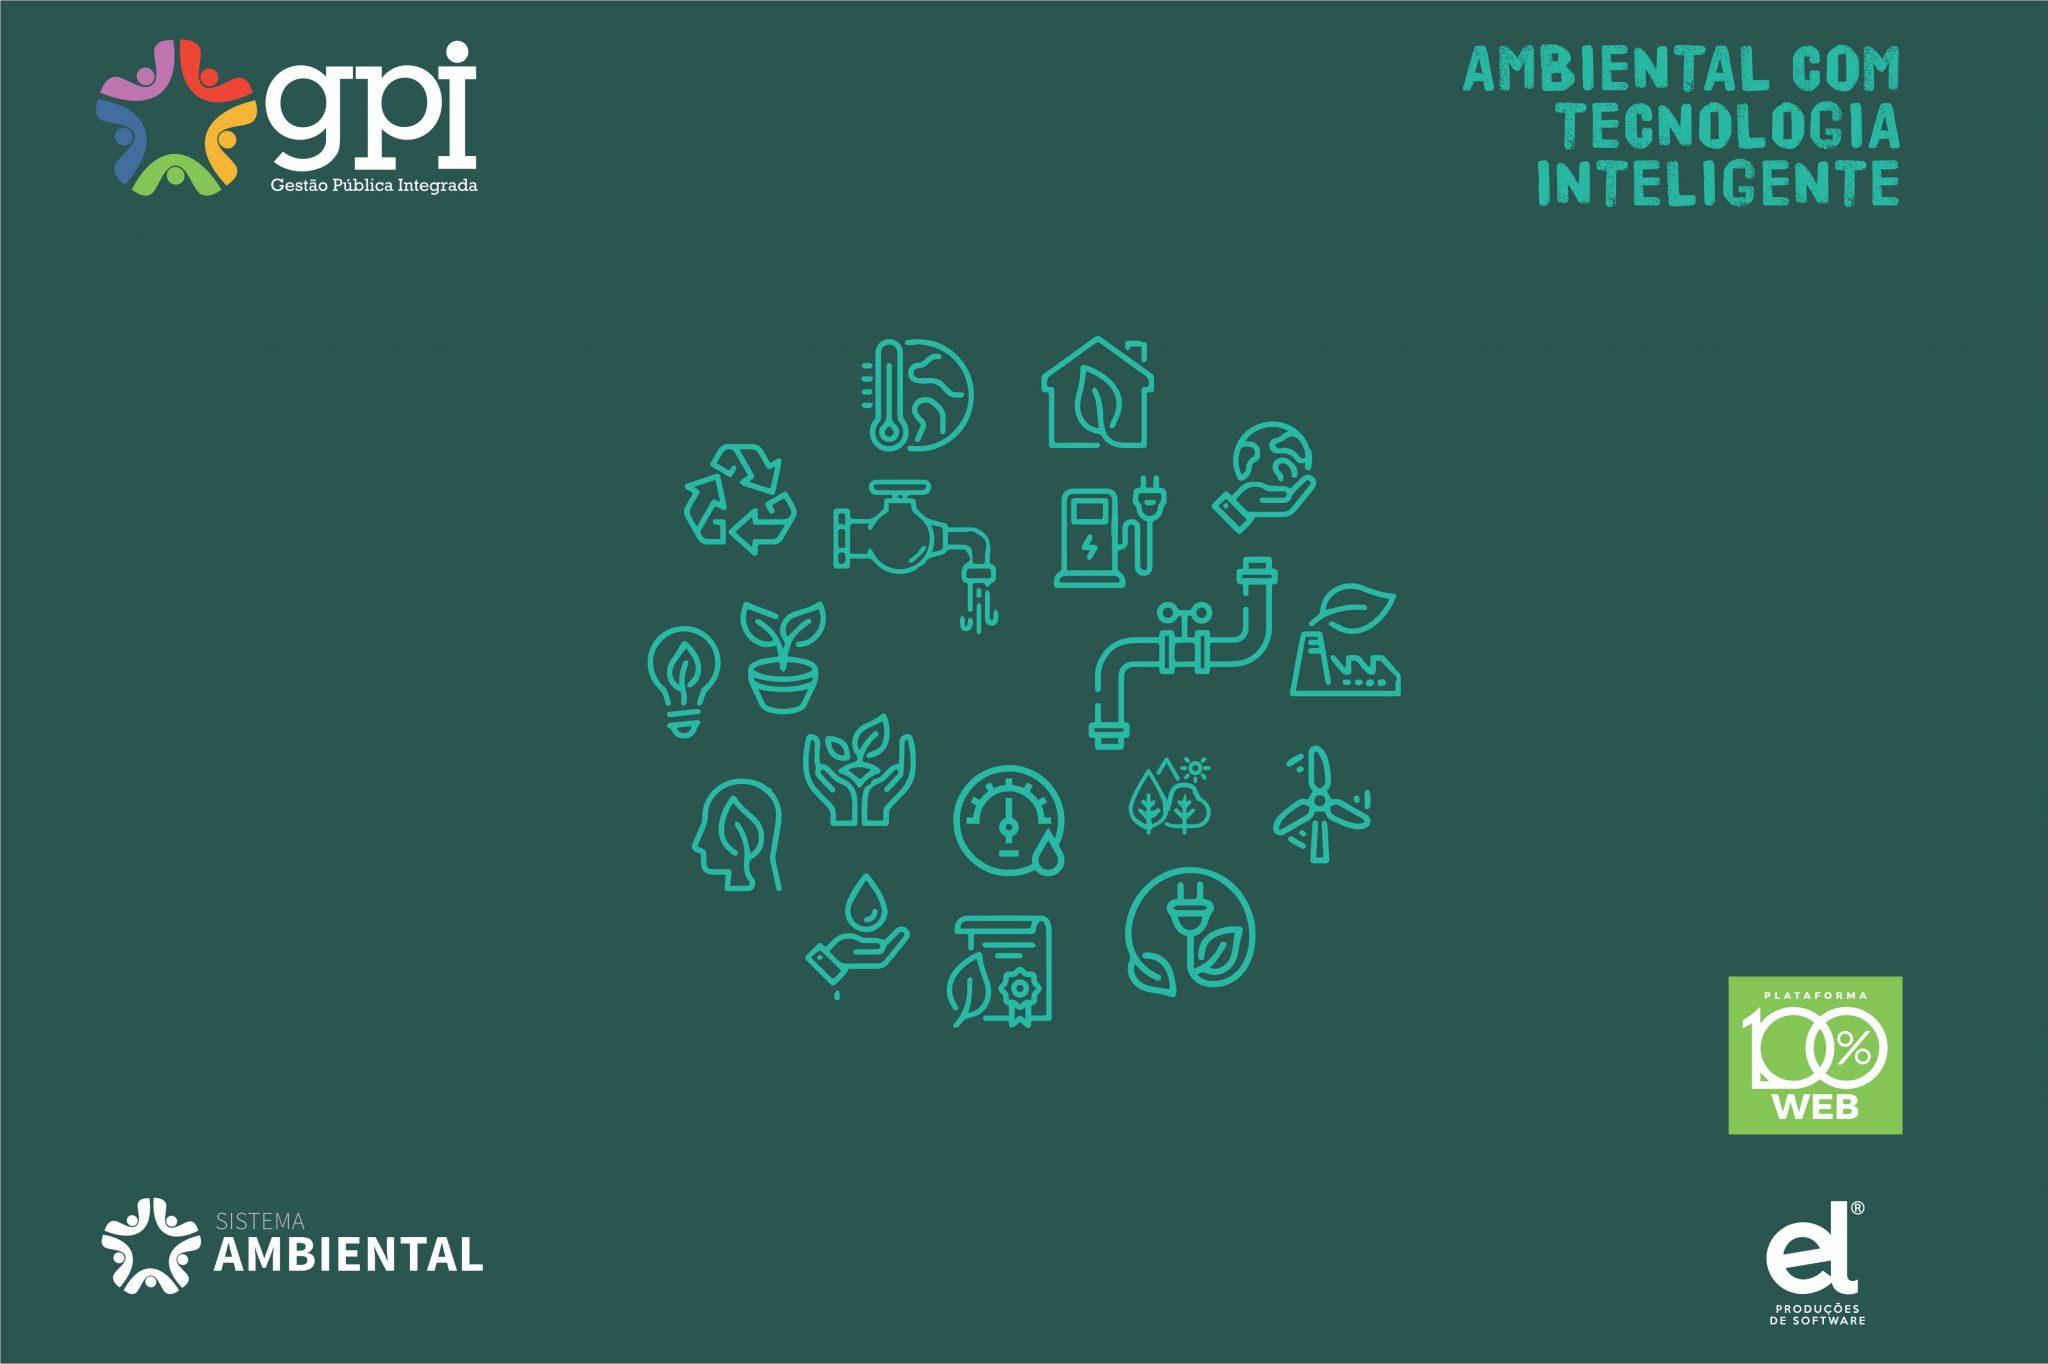 ambiental-port-2048x1364